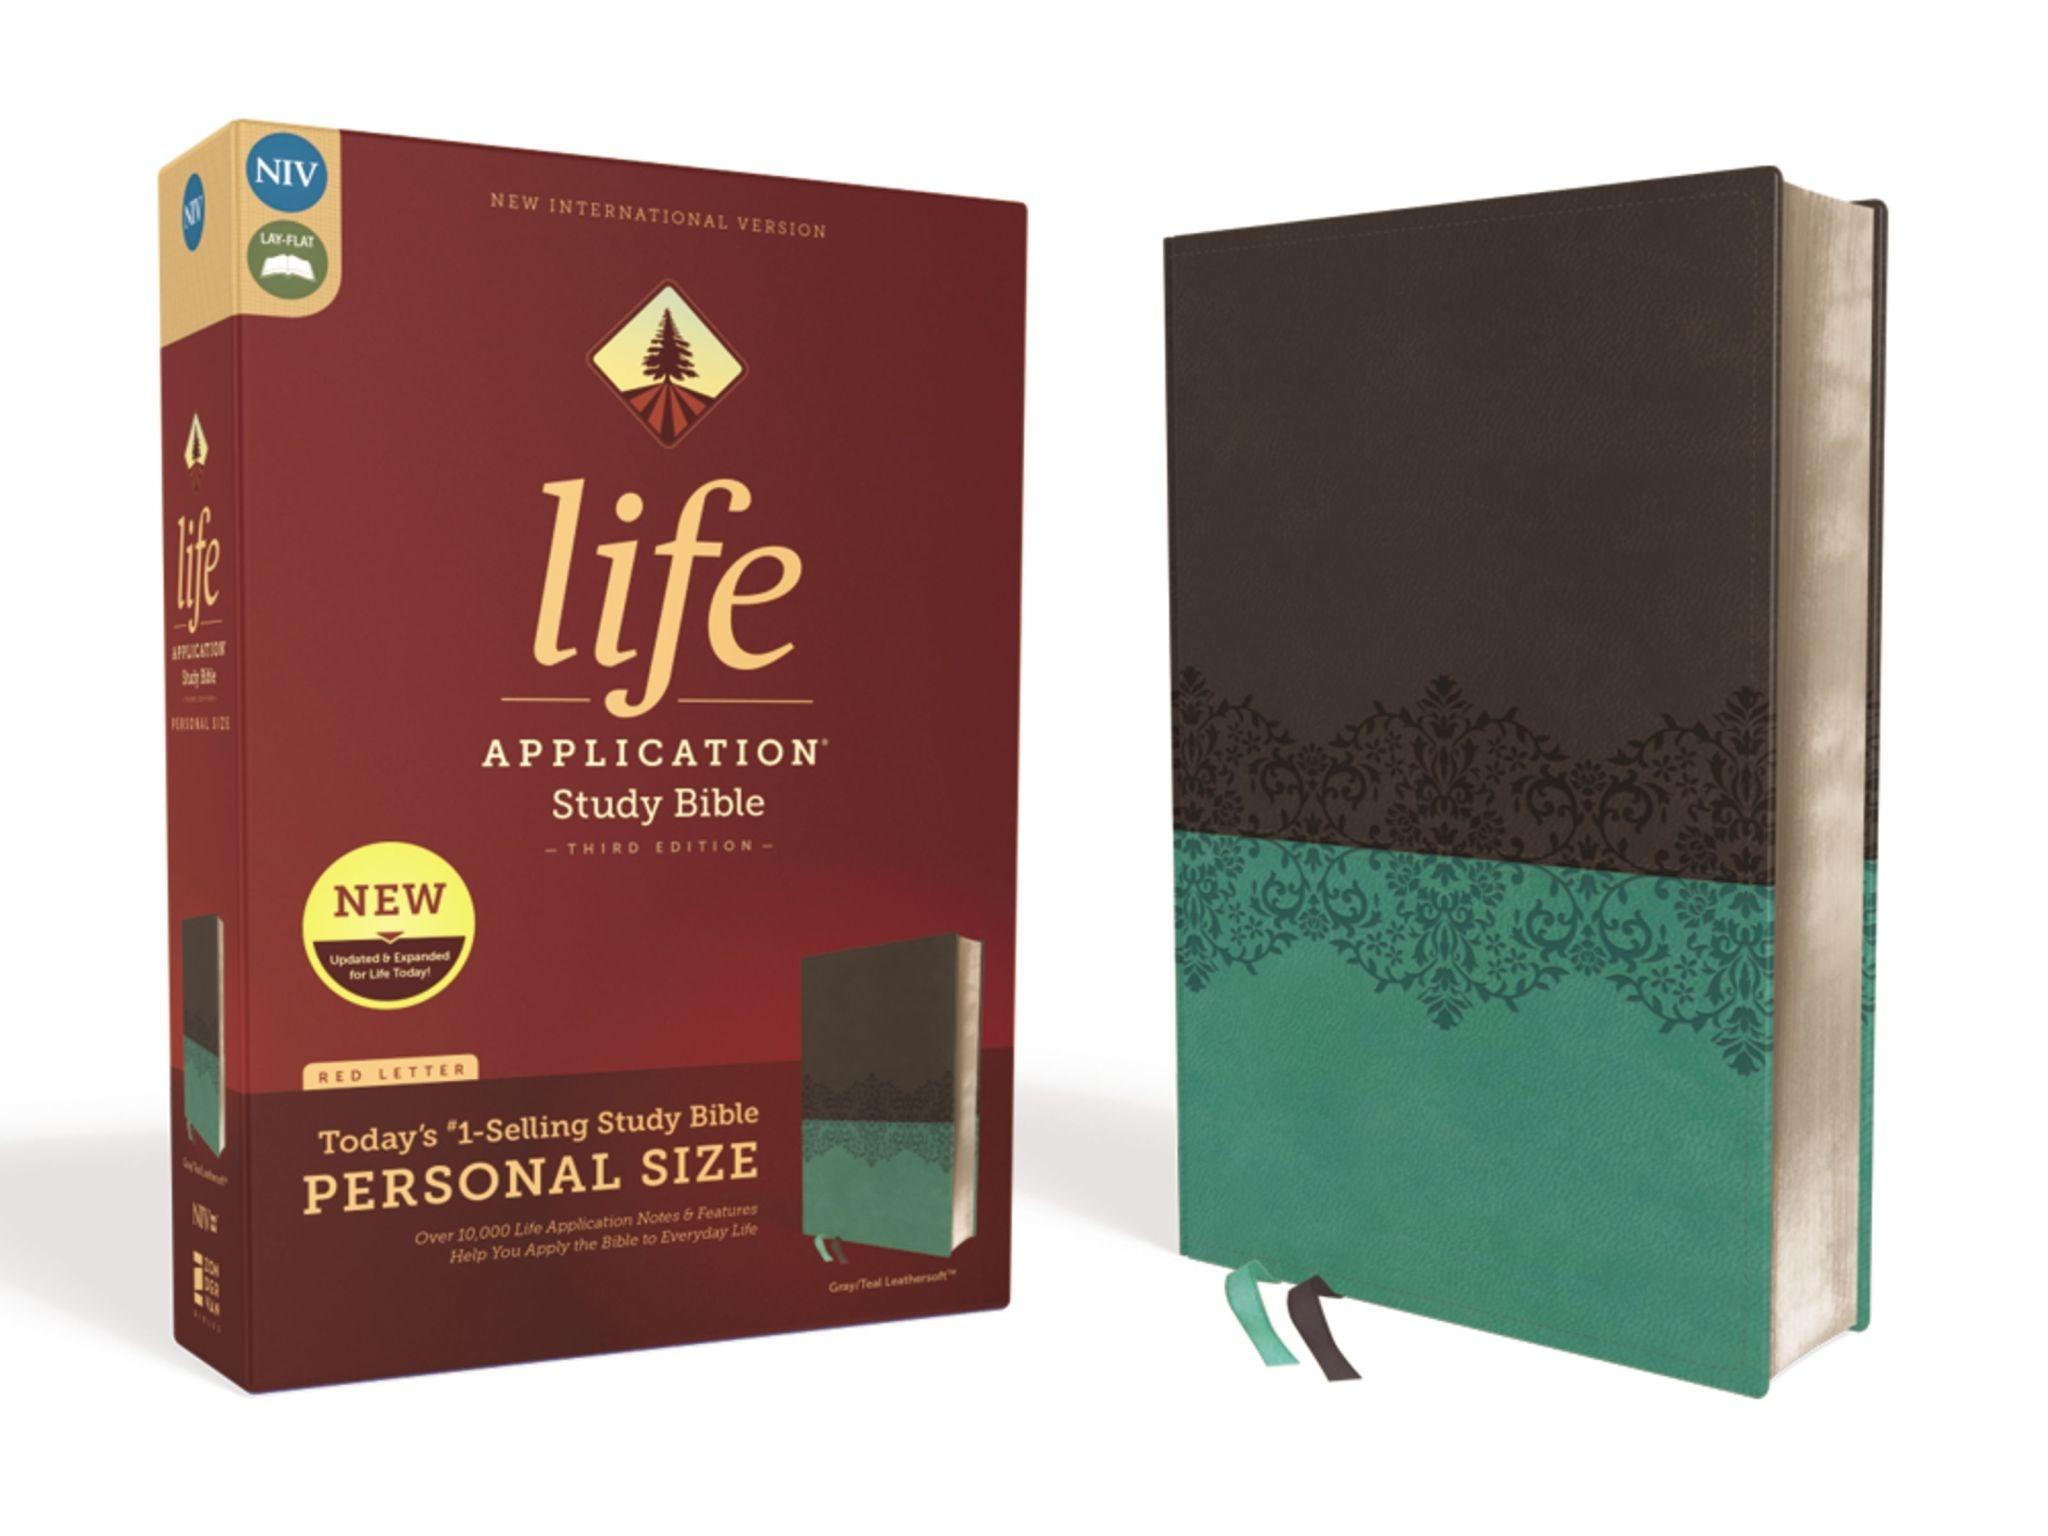 Personal Size NIV Life Application Study Bible - Gray/Teal